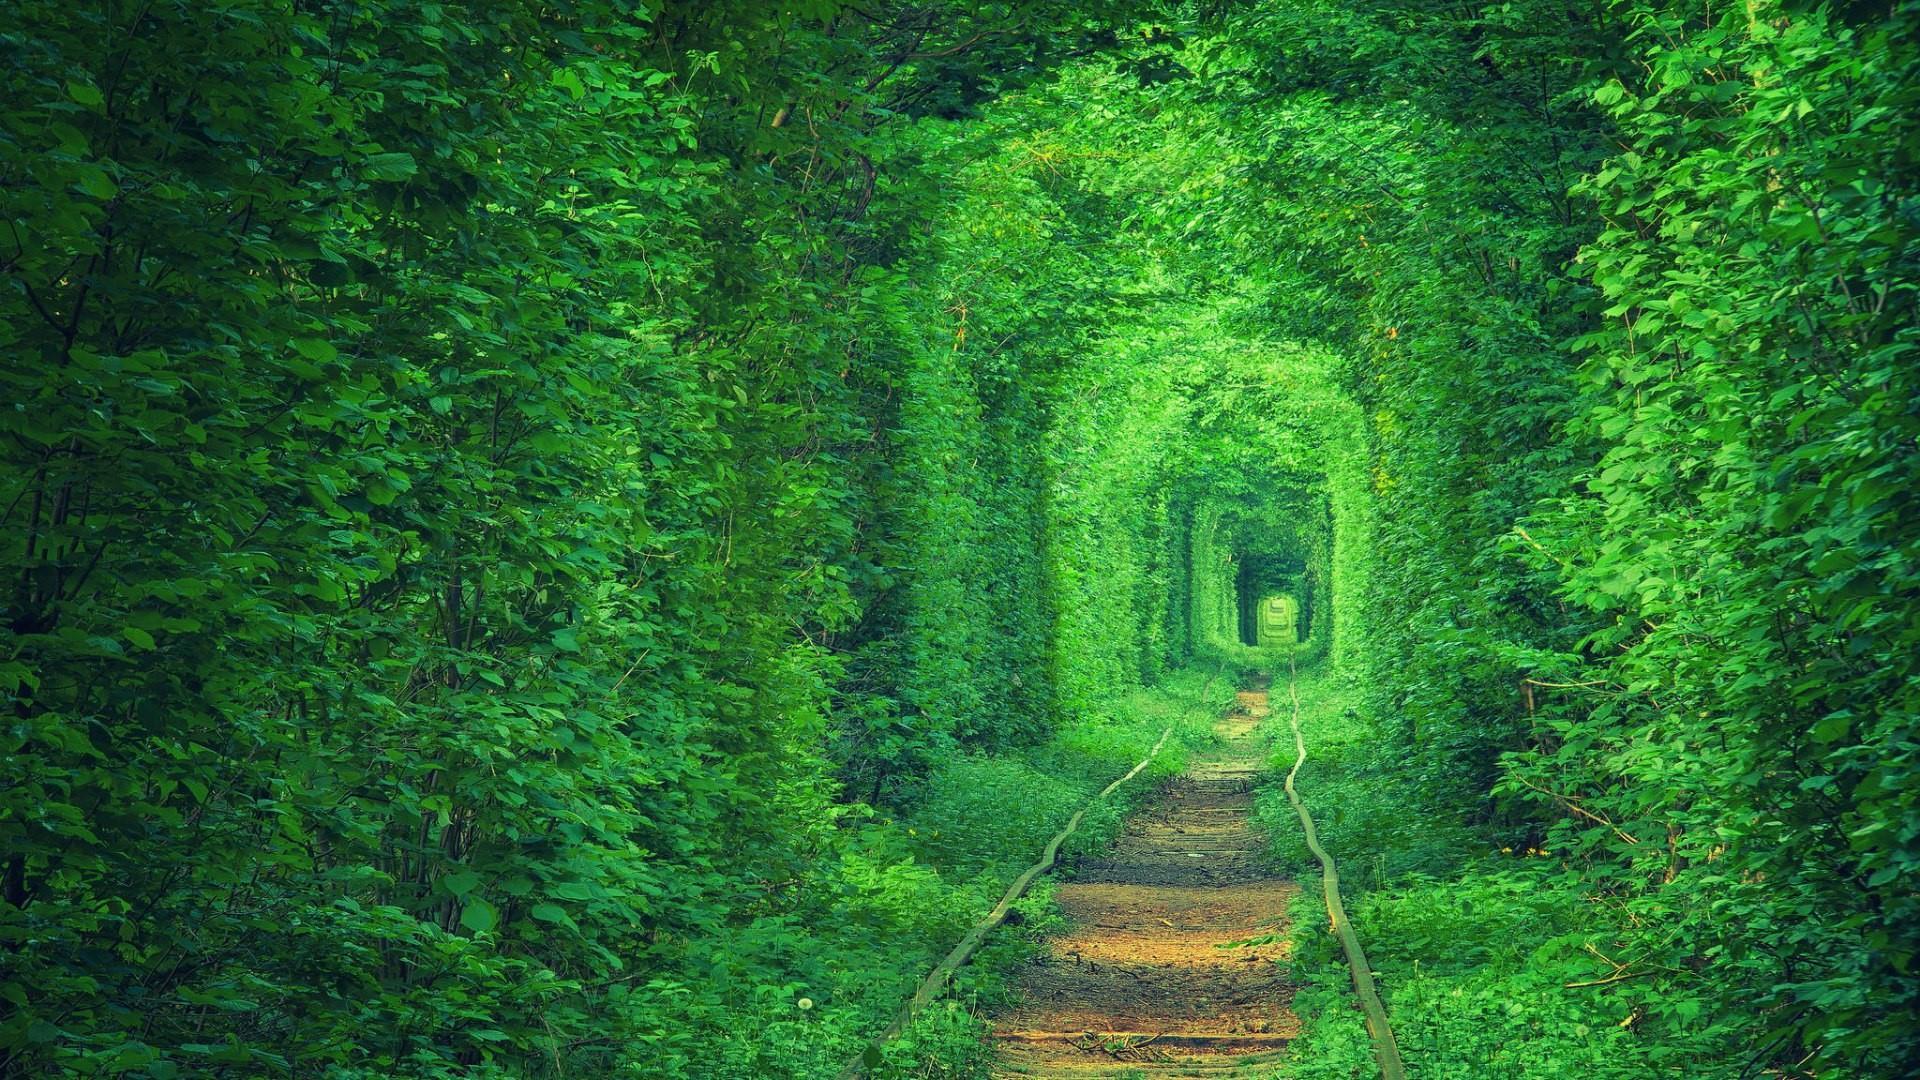 Tunnel of Love (Tunel Kokhannya) wallpaper